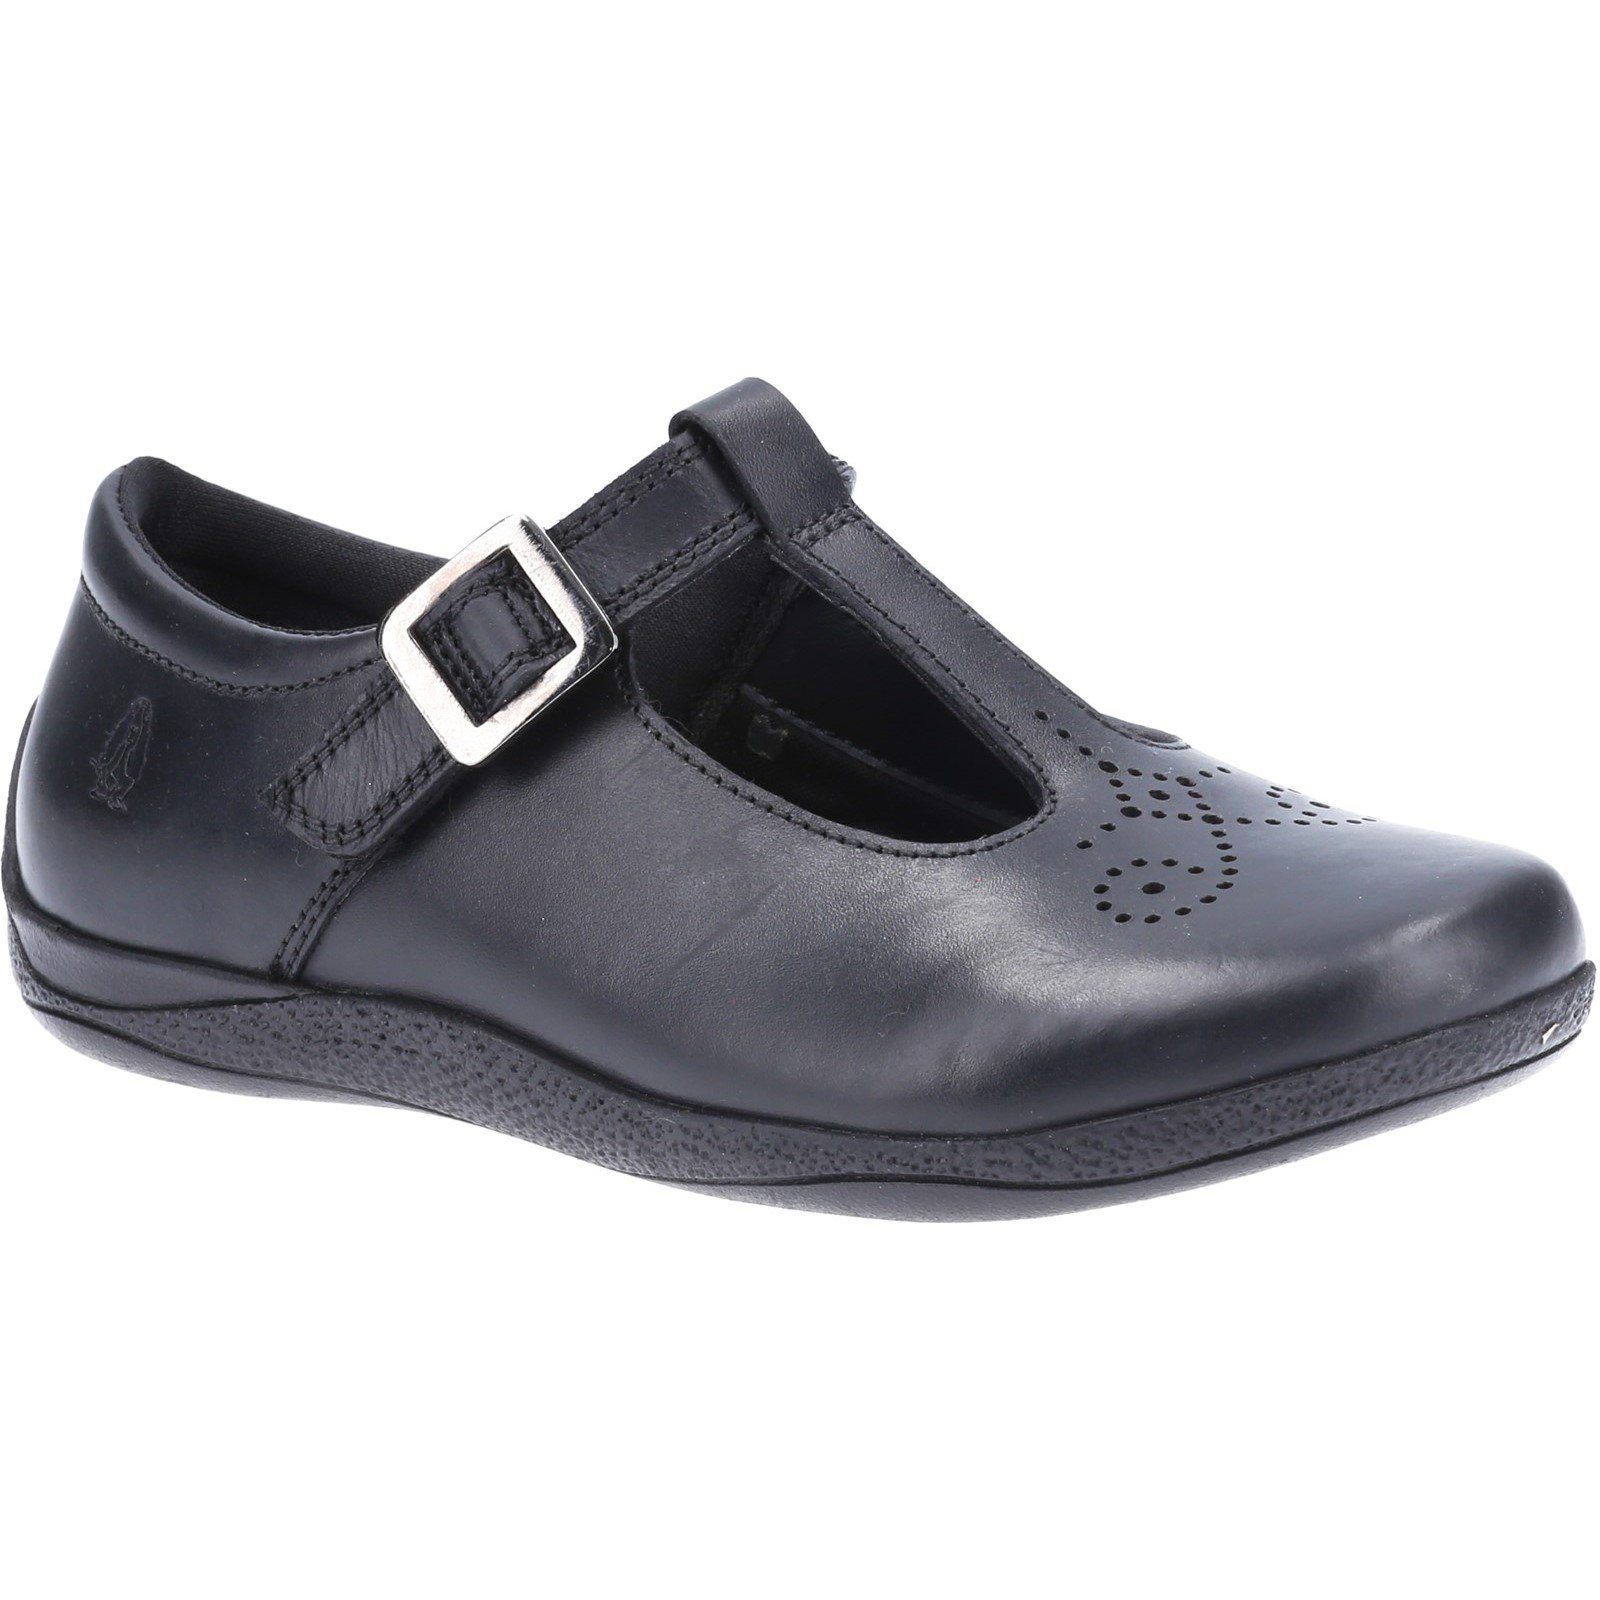 Hush Puppies Kid's Eliza Junior School Shoe Black 32589 - Black 11